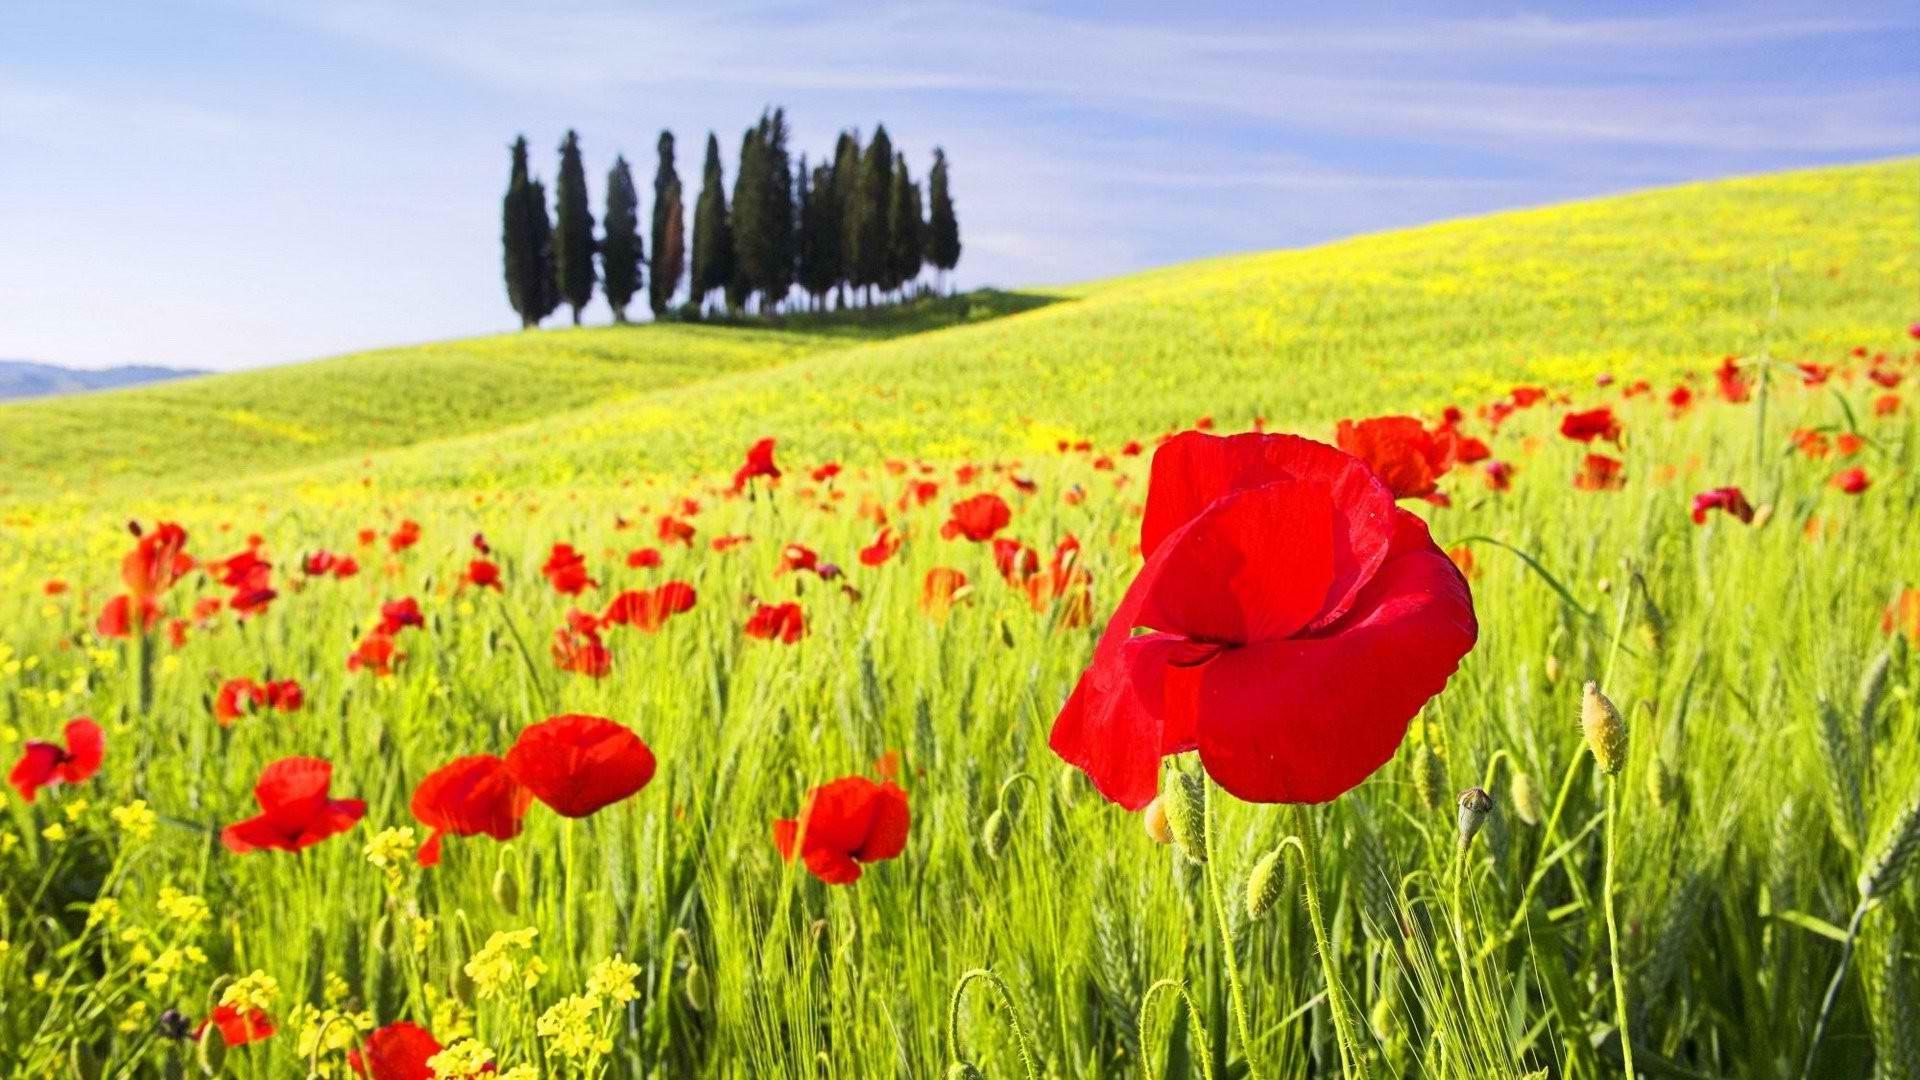 Fondos de pantalla paisaje flores c sped campo for Immagini full hd 1920x1080